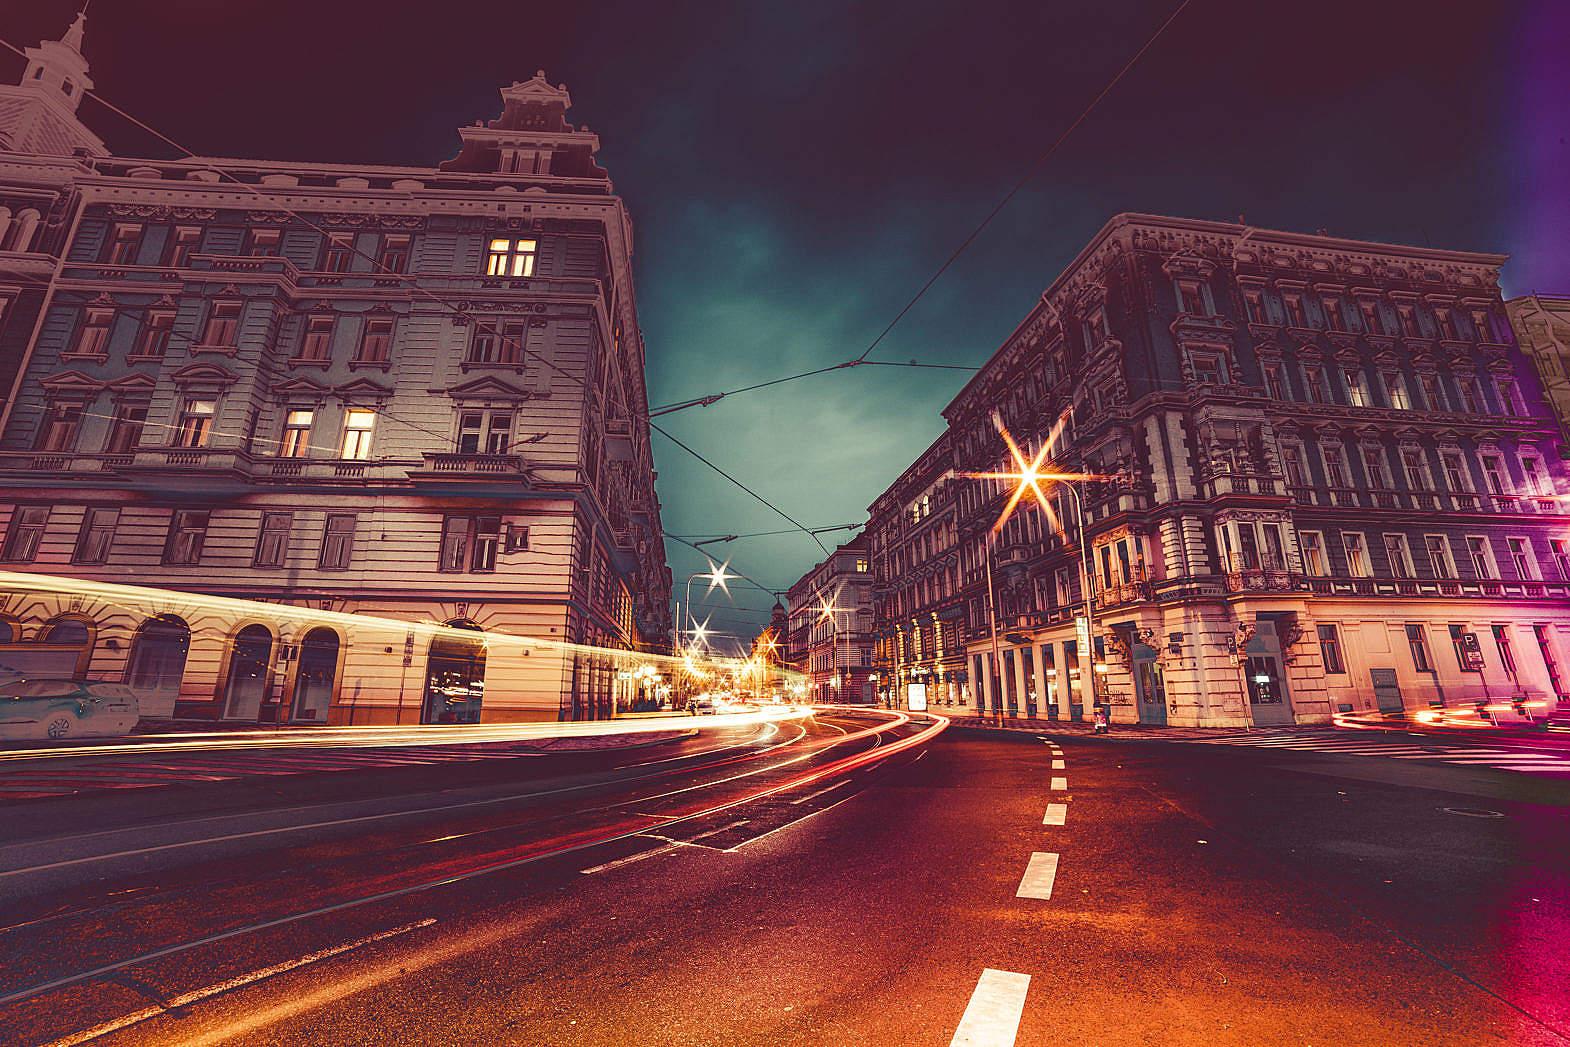 prague-streets-at-night-colorful-abstract-edit_free_stock_photos_picjumbo_DSC00904-1570x1047.jpg